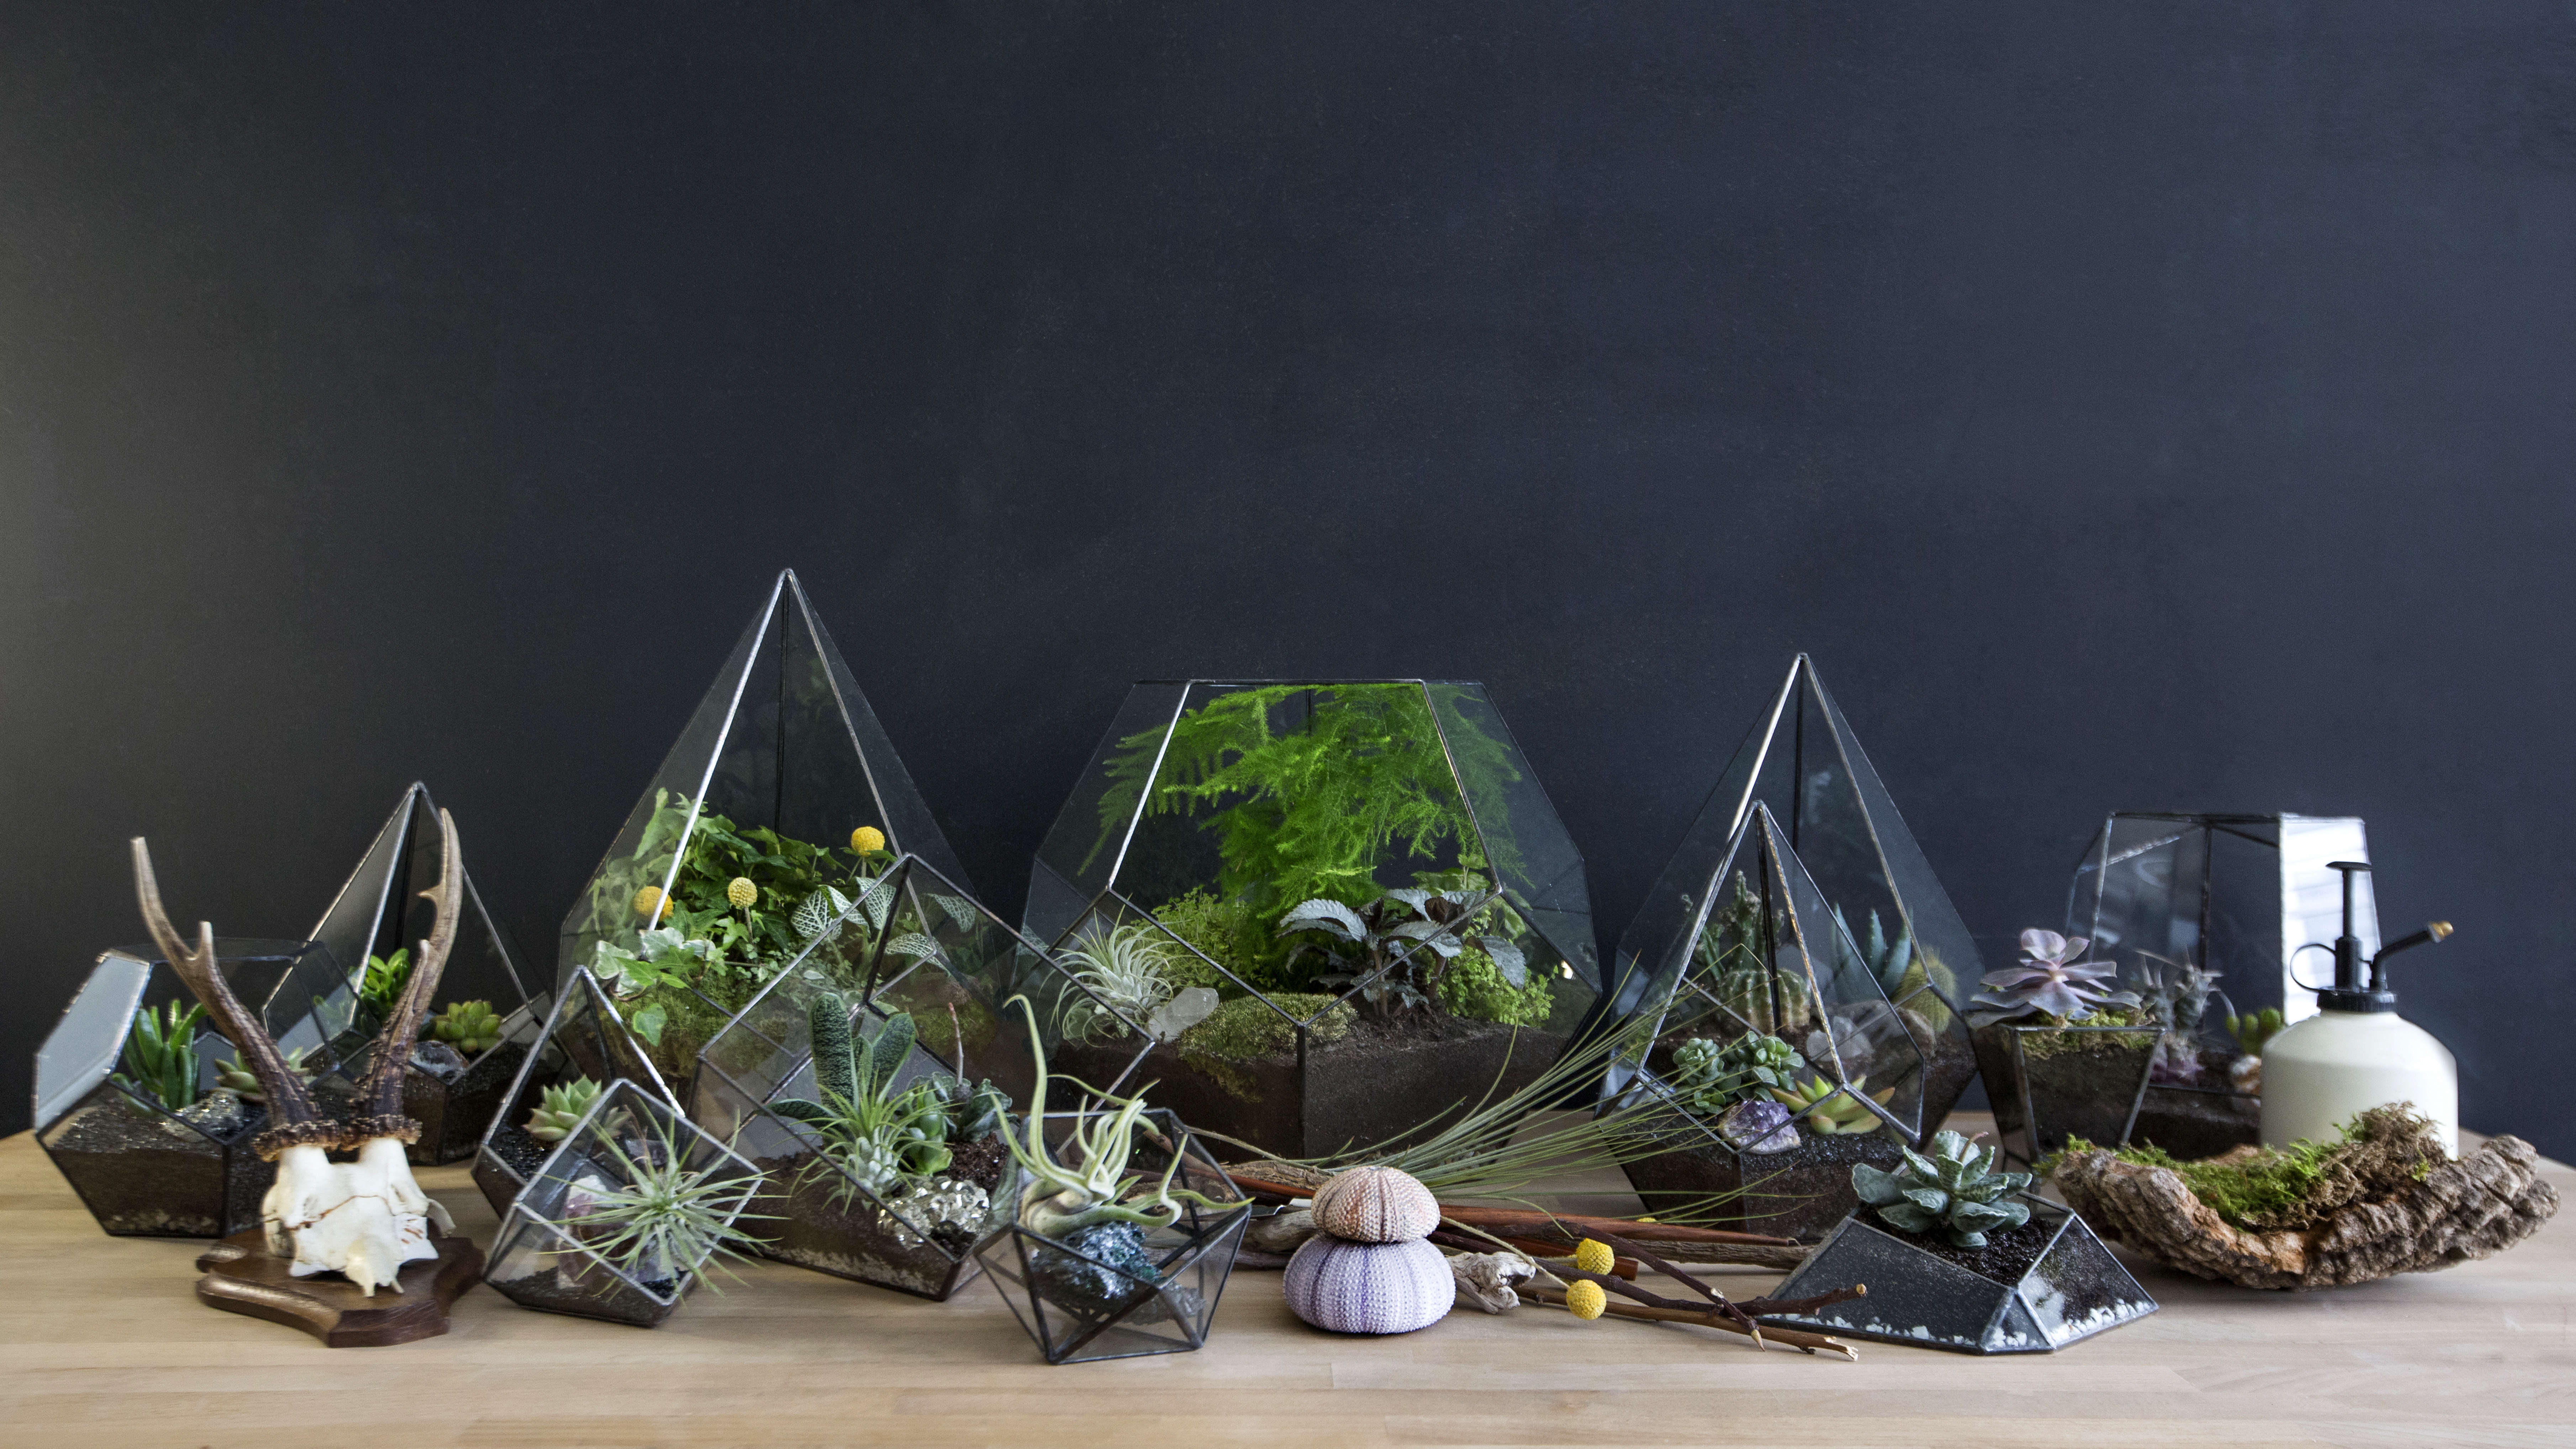 Evergreen Living with Plants Muz Botanik Kahle Vases in Turkey, Photo by Maurizio Braggiotti